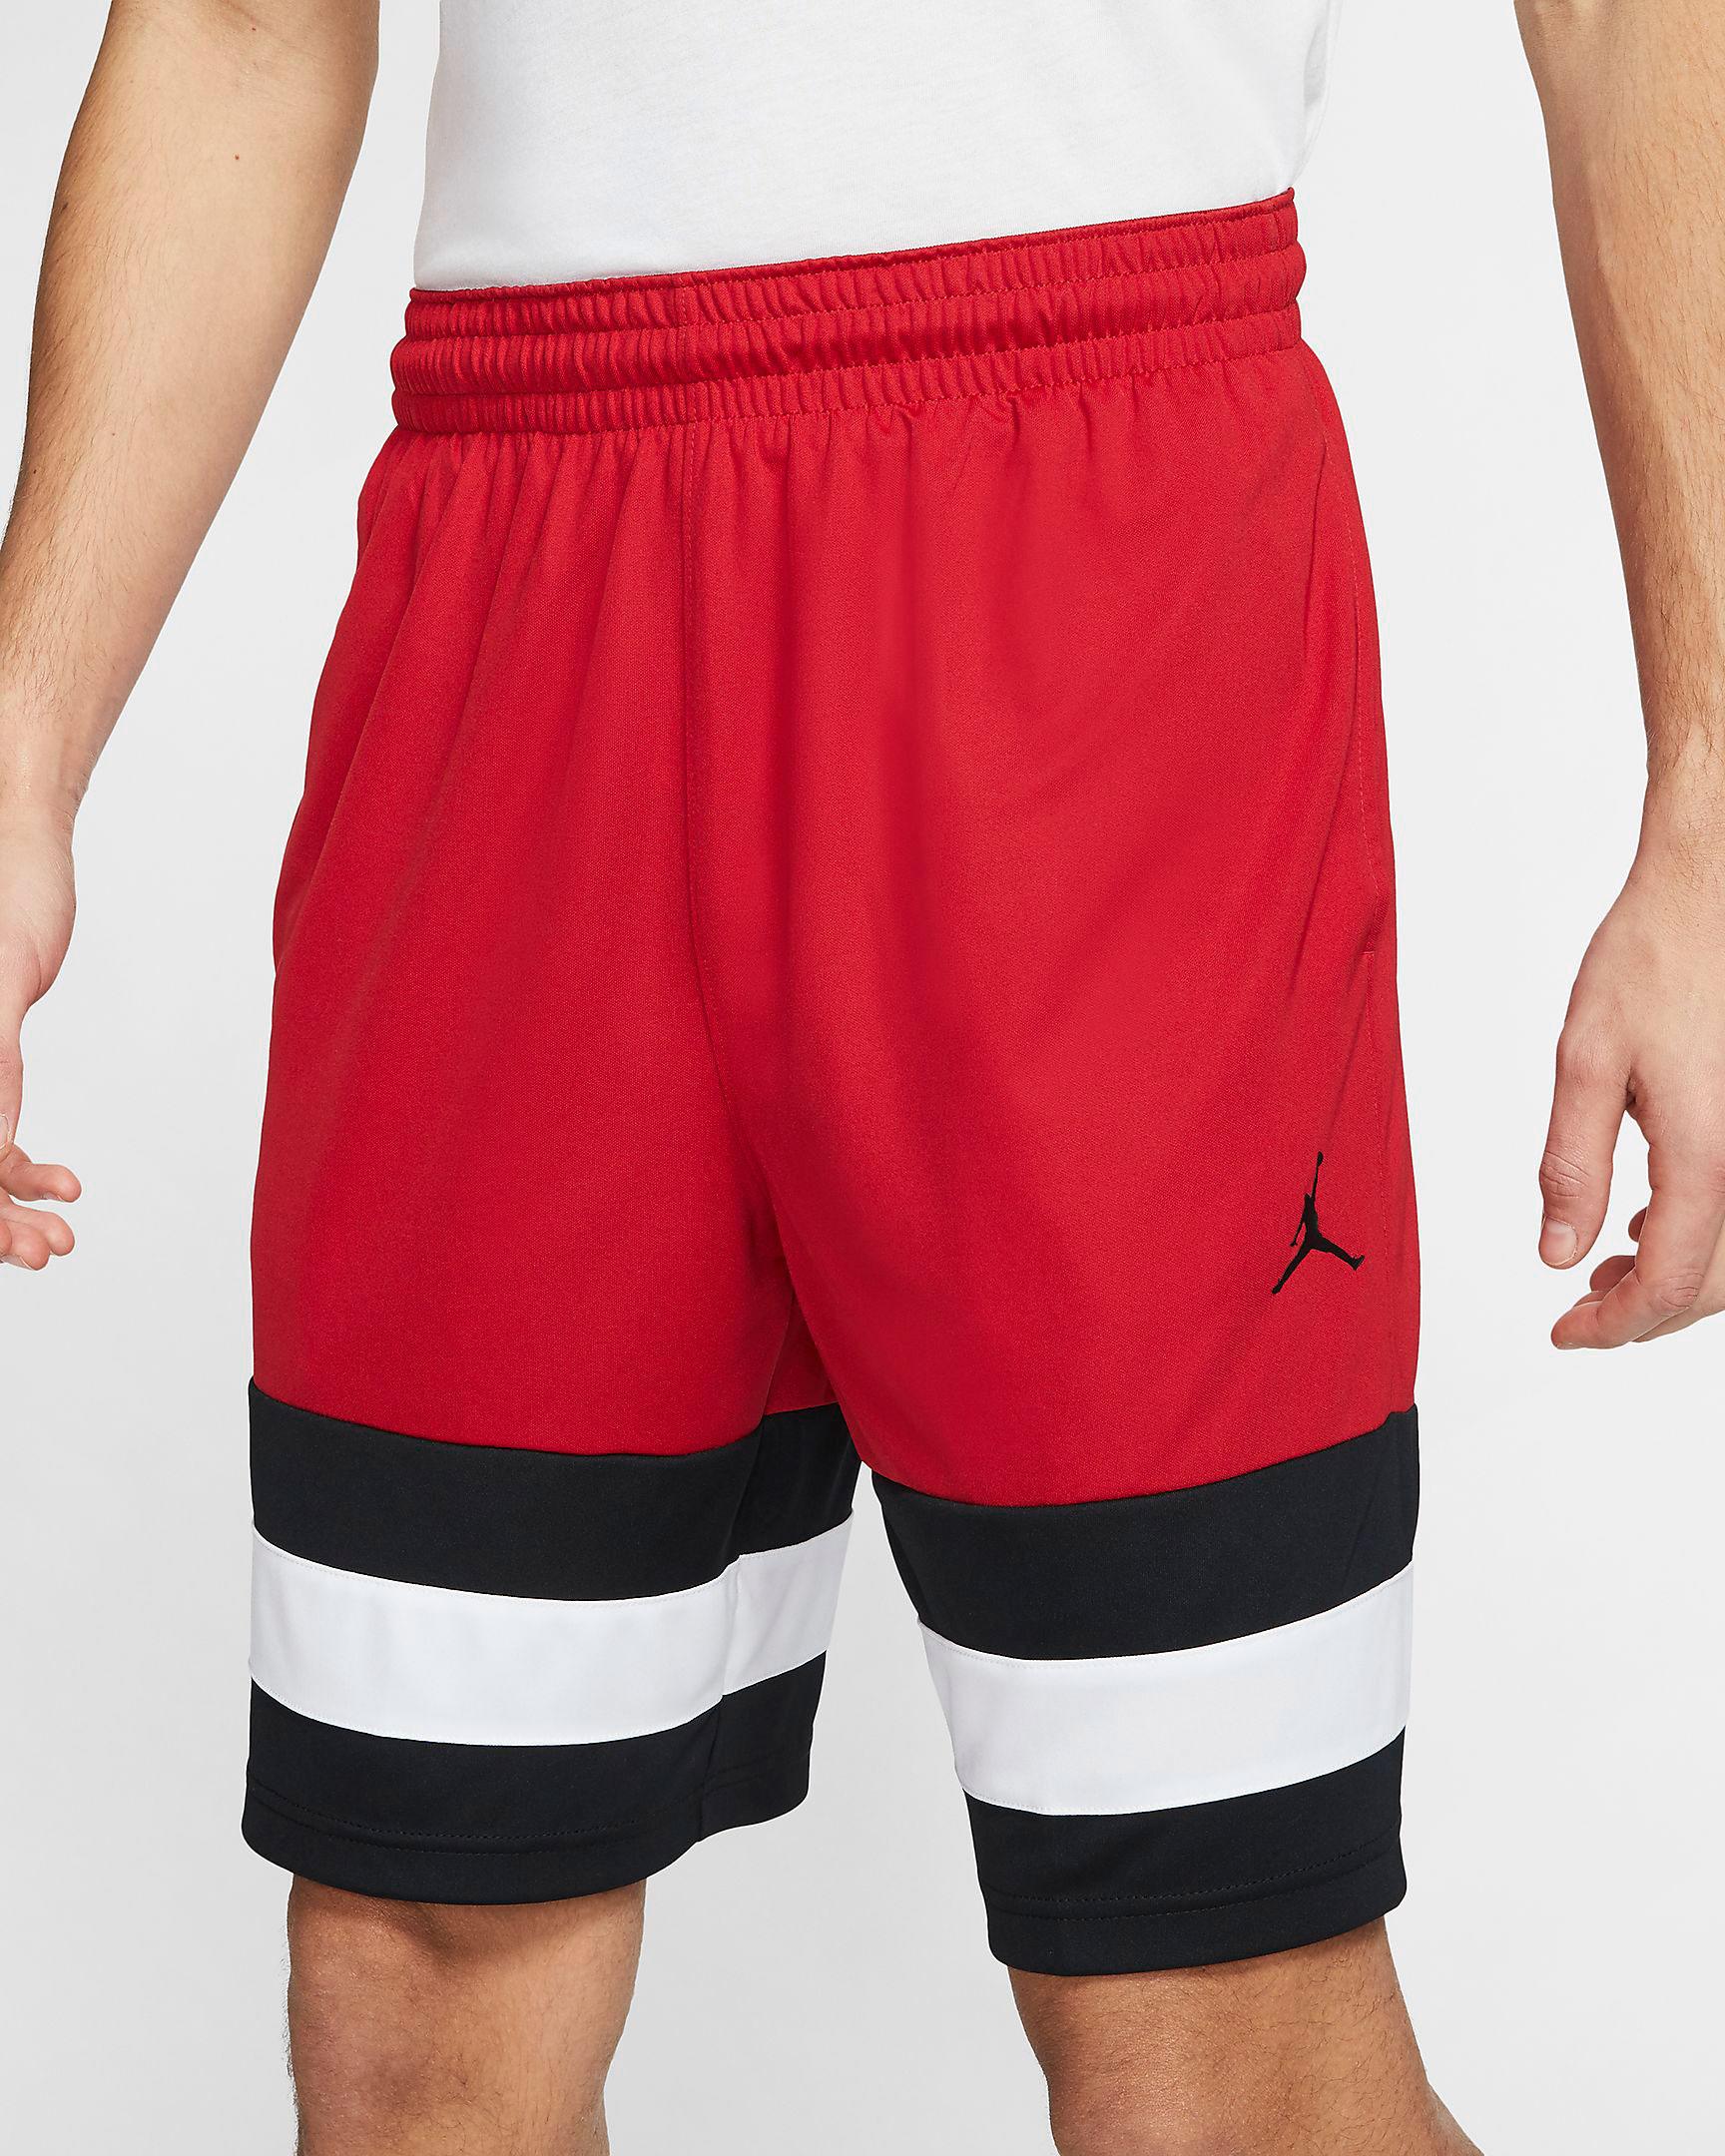 air-jordan-4-metallic-red-shorts-3